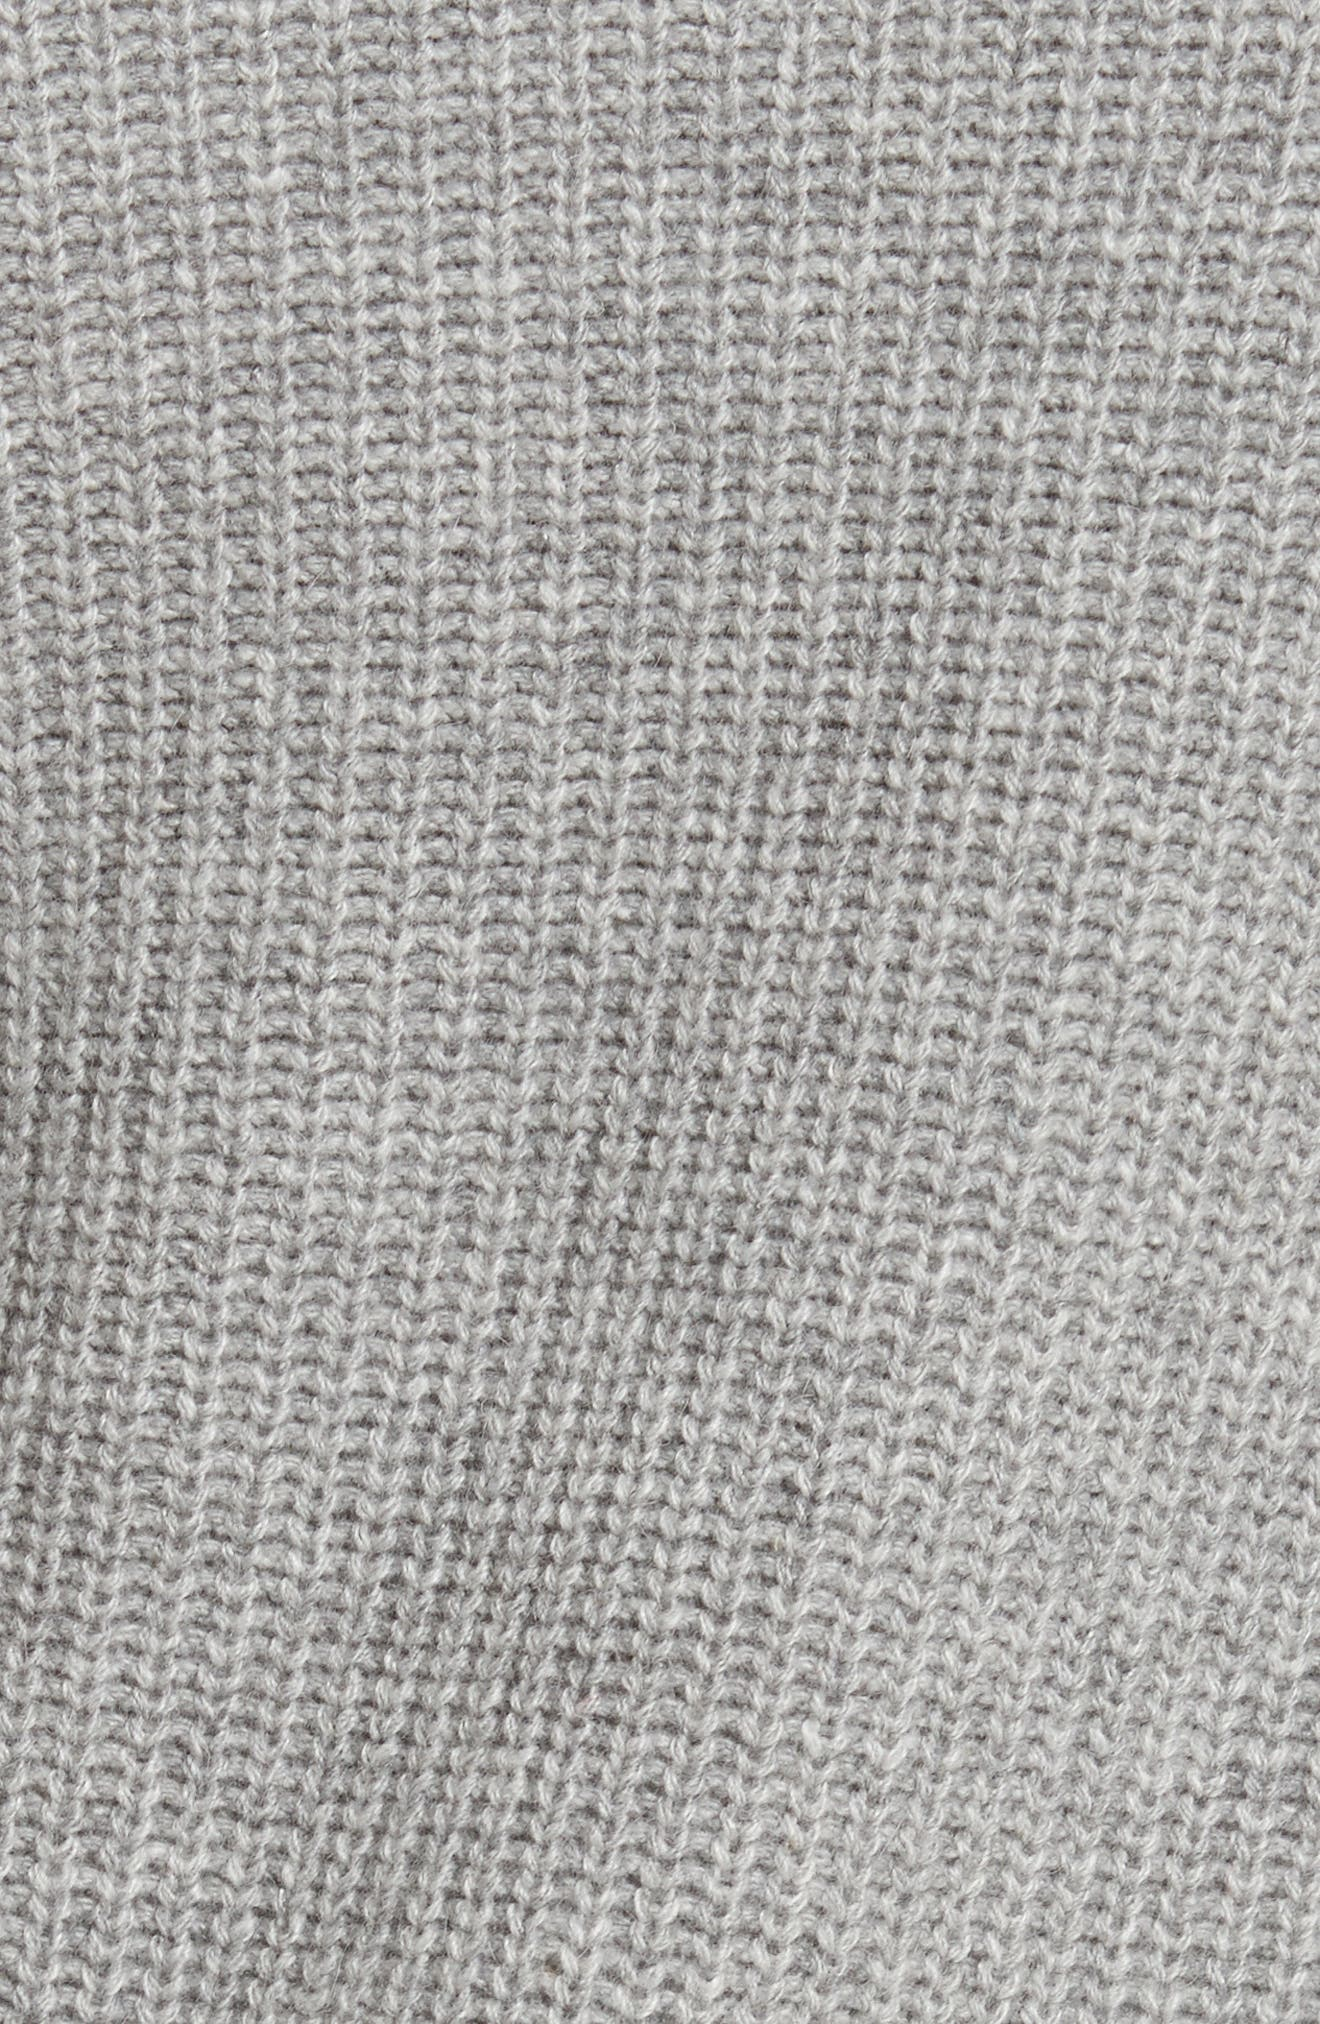 Bree Wrap Waist Sweater,                             Alternate thumbnail 5, color,                             Dovetail Melange